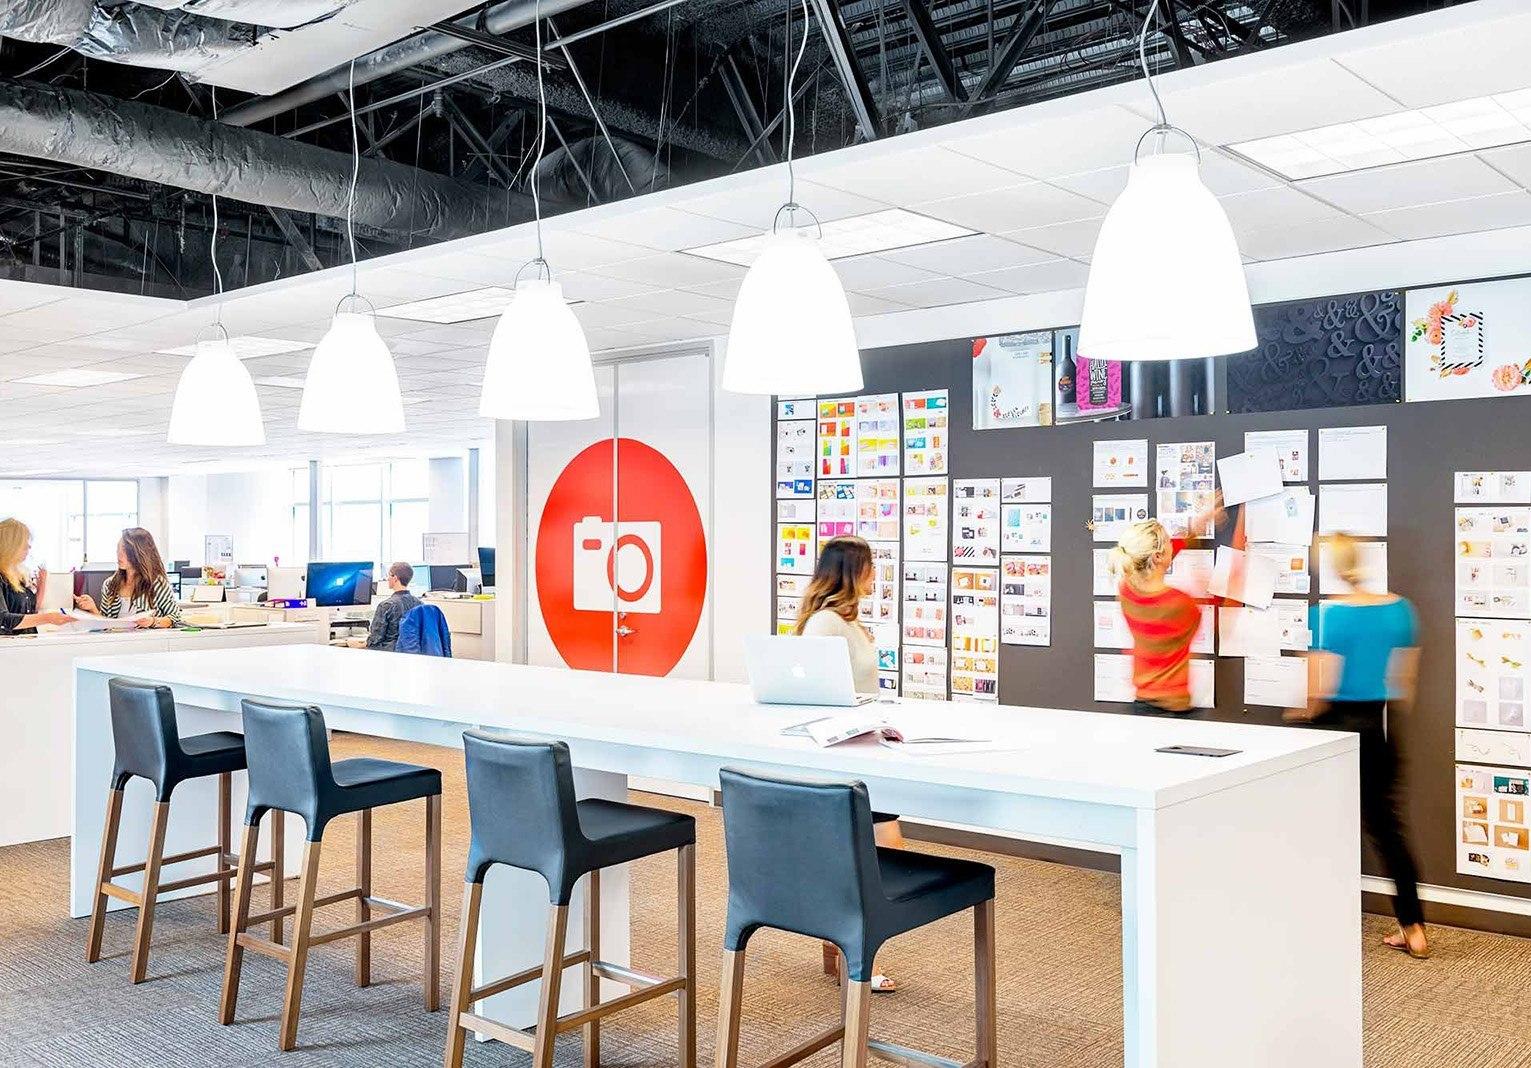 A Look Inside Shutterfly's Santa Clara Office